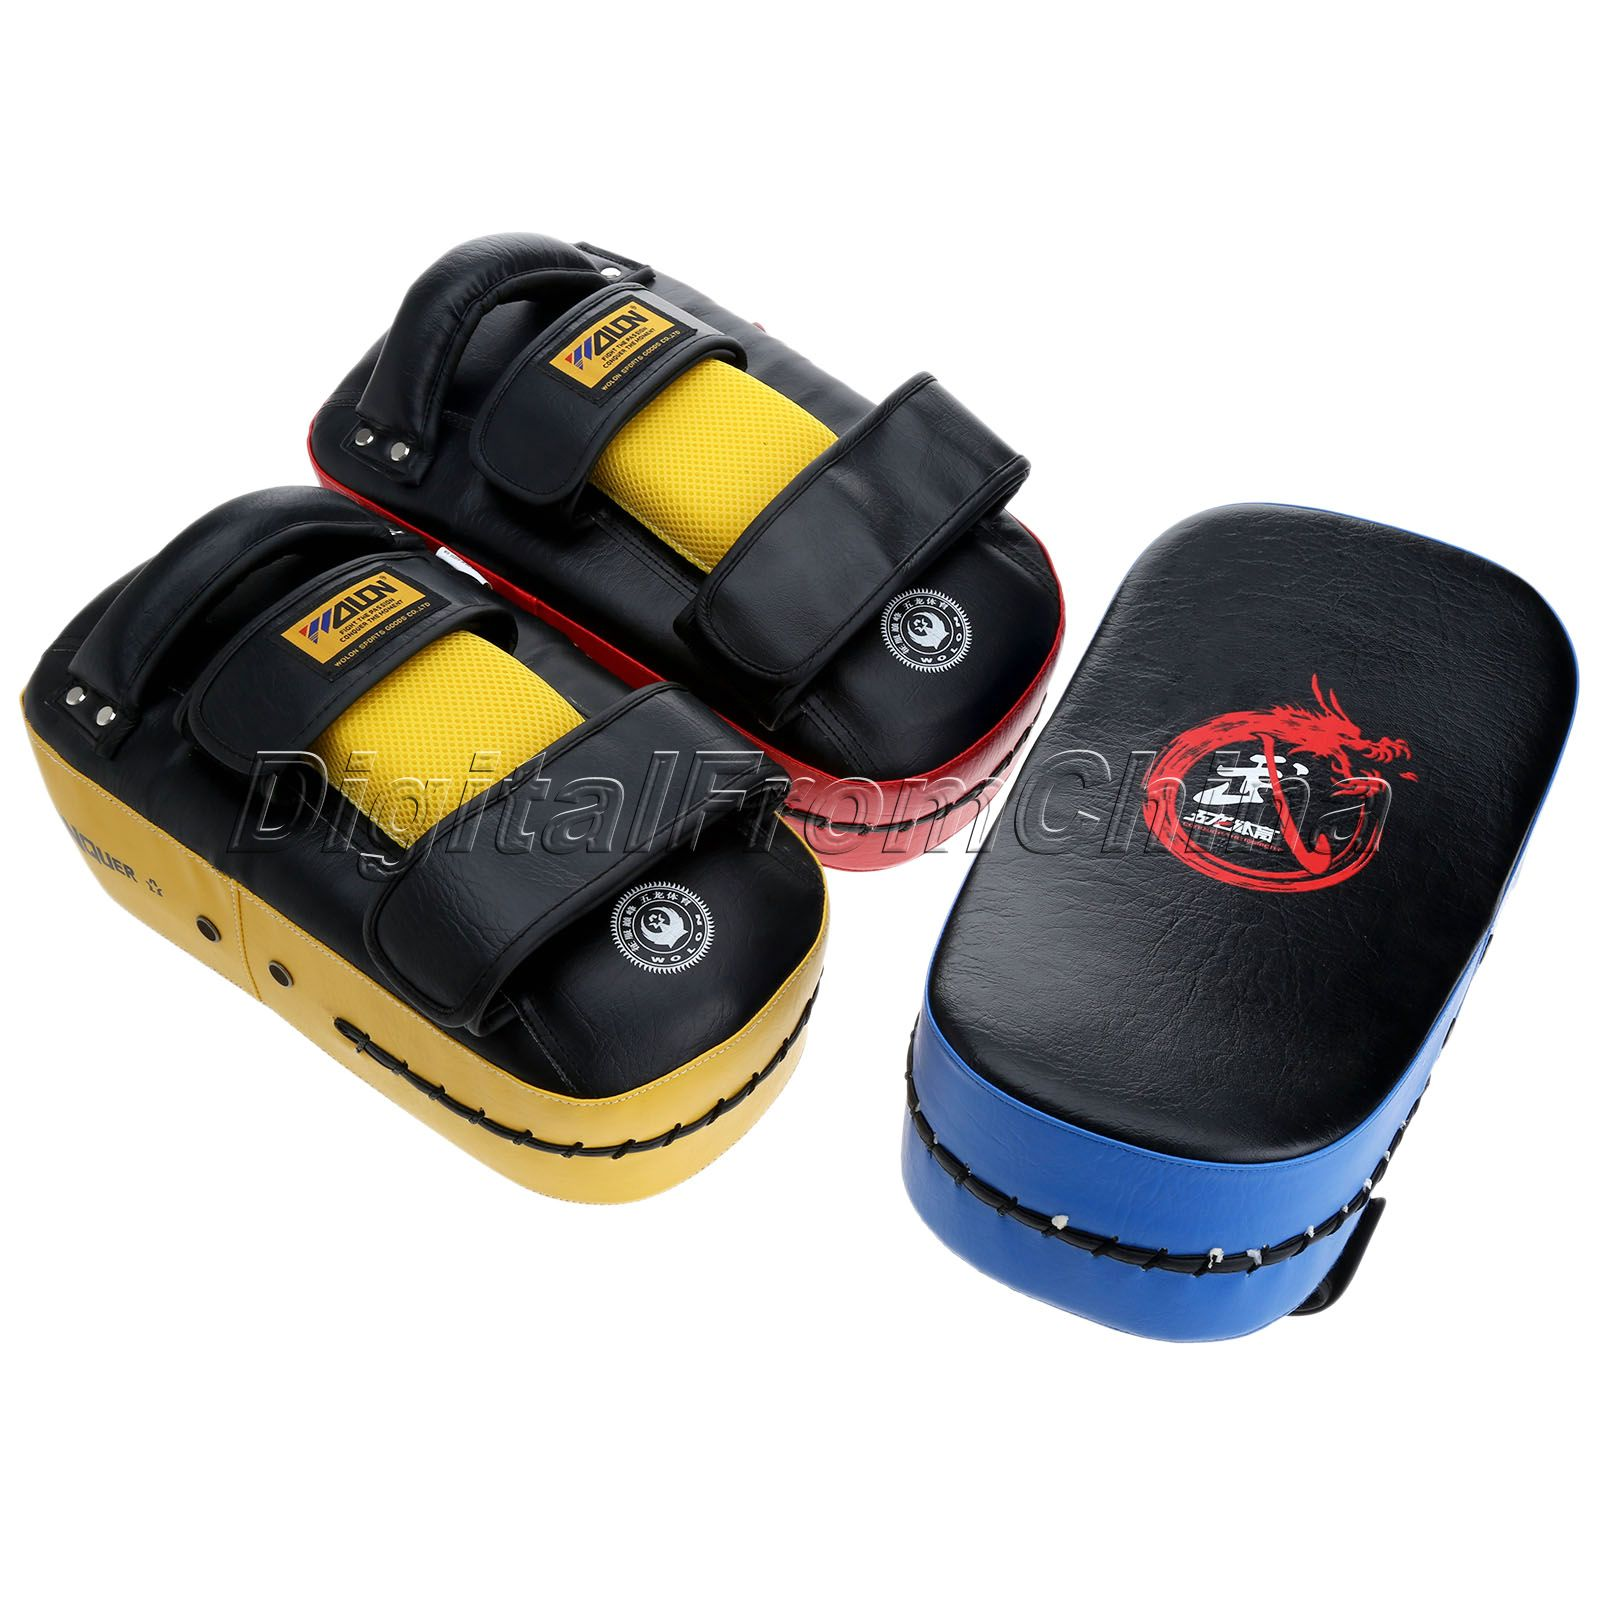 Mens leather gloves target - Boxing Pad Pu Leather Top Quality Muay Thai Kick Boxing Gloves Target Taekwondo Sanda Training Punching